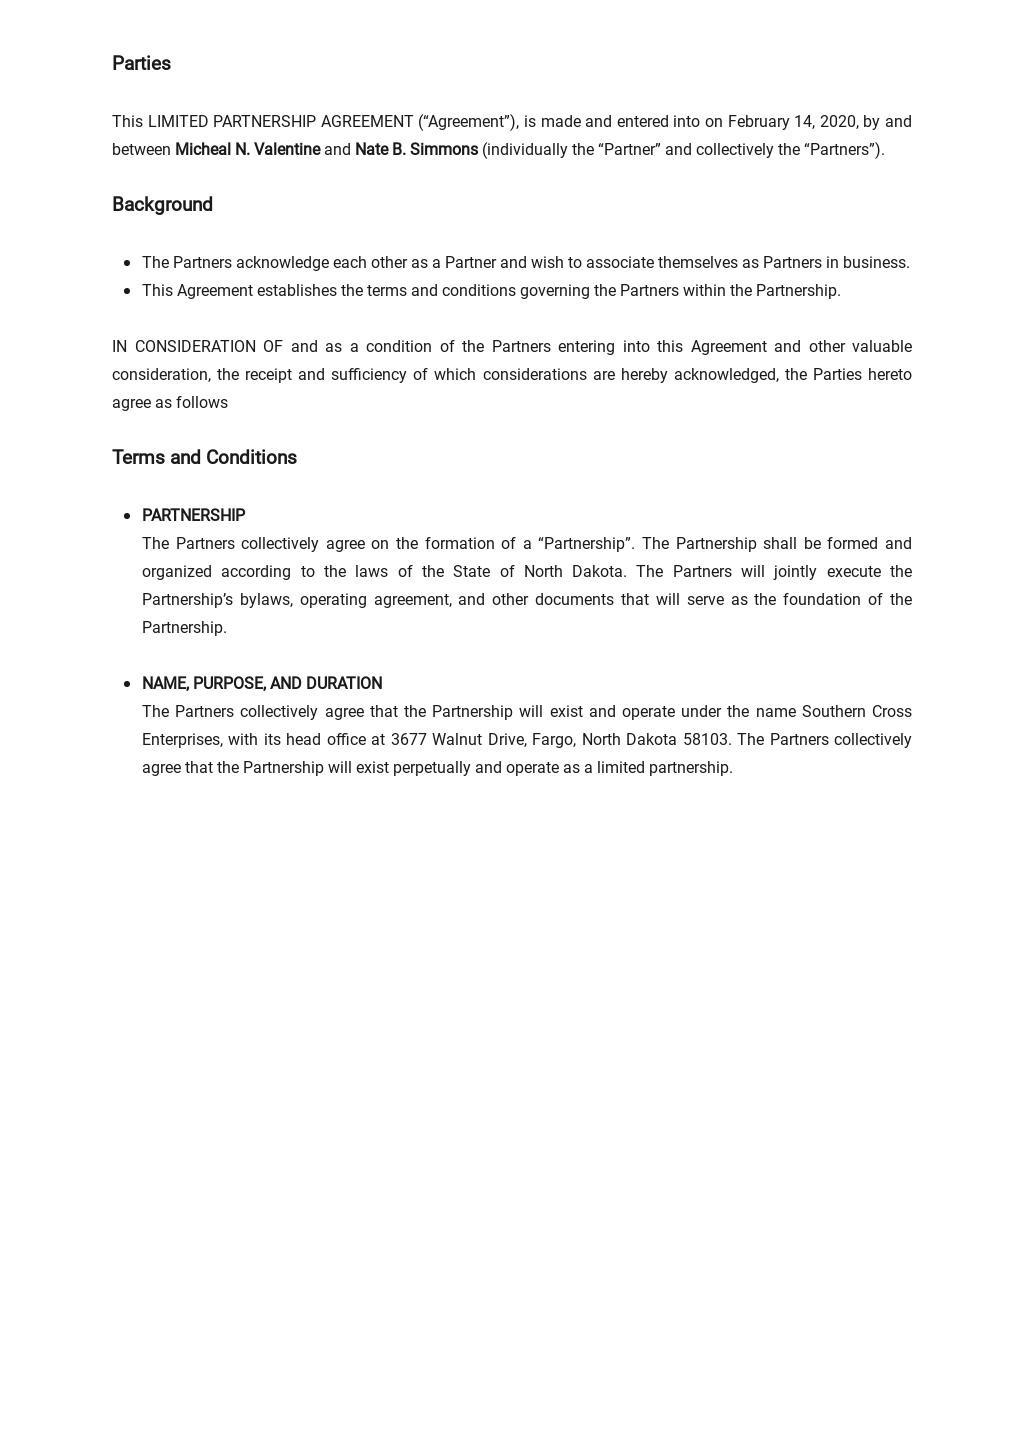 Limited Partnership Agreement Template 1.jpe